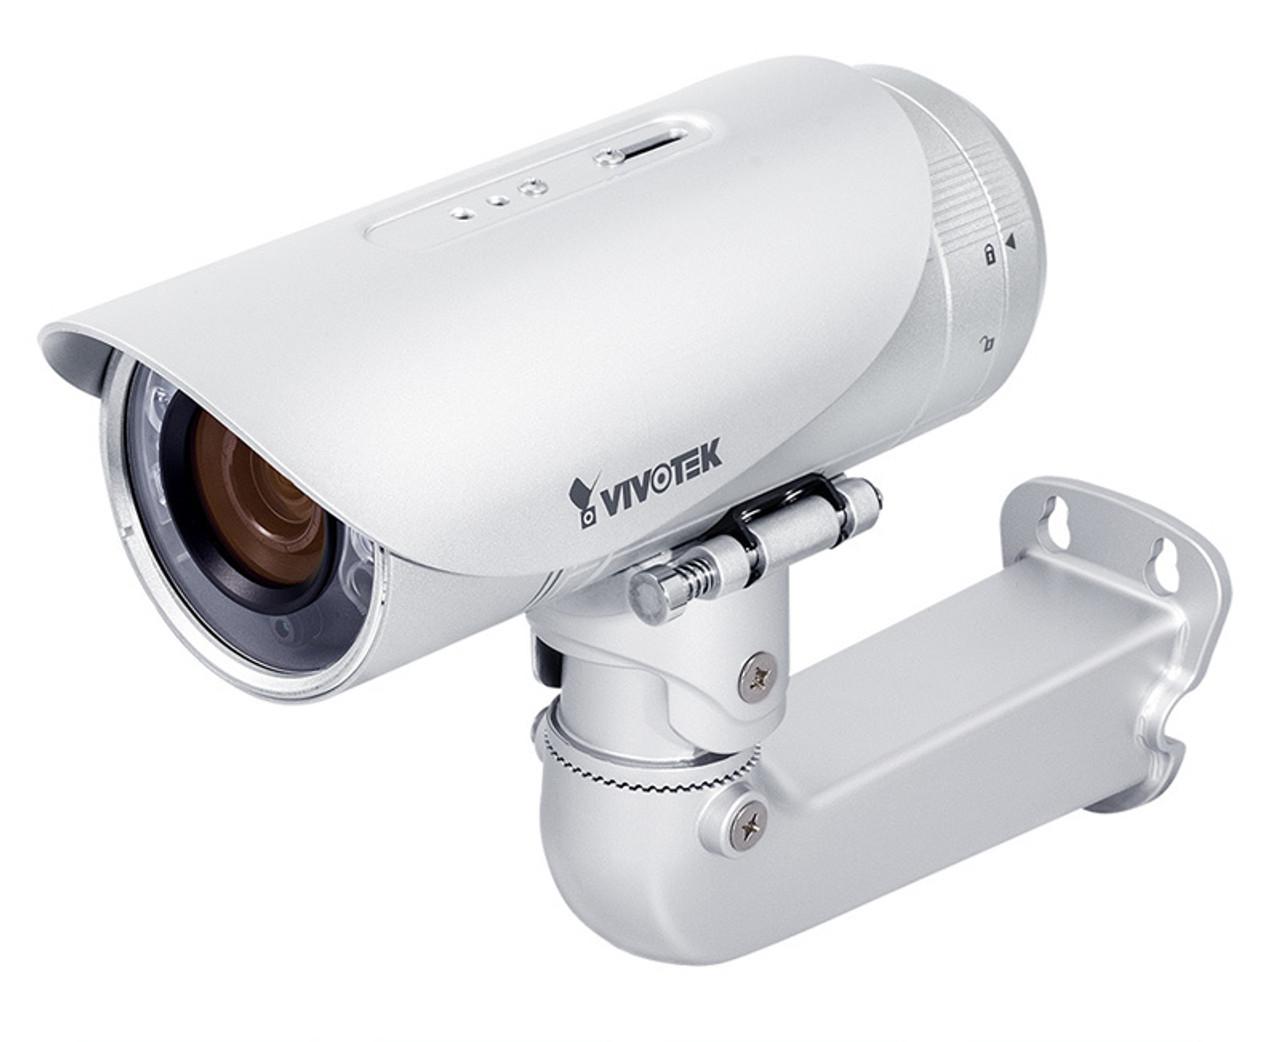 Vivotek IB8373-EH 3MP Outdoor IR Bullet IP Security Camera - WDR Pro, Smart  Stream, Smart Focus, 30M Smart IR